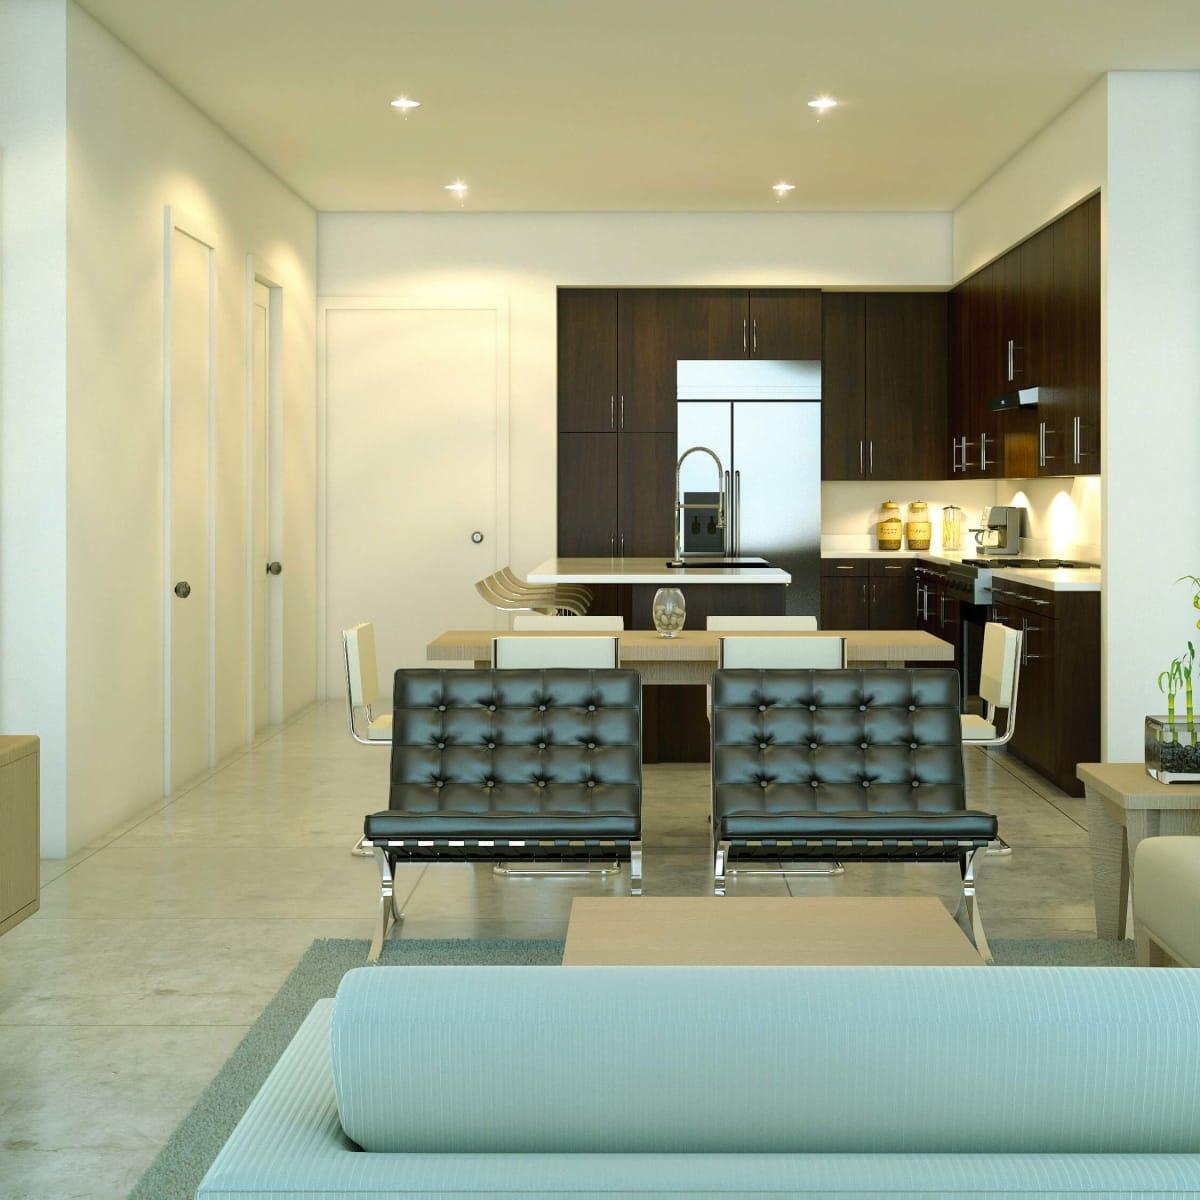 Houston, Urban Flats Condos_August 2015, interior 2